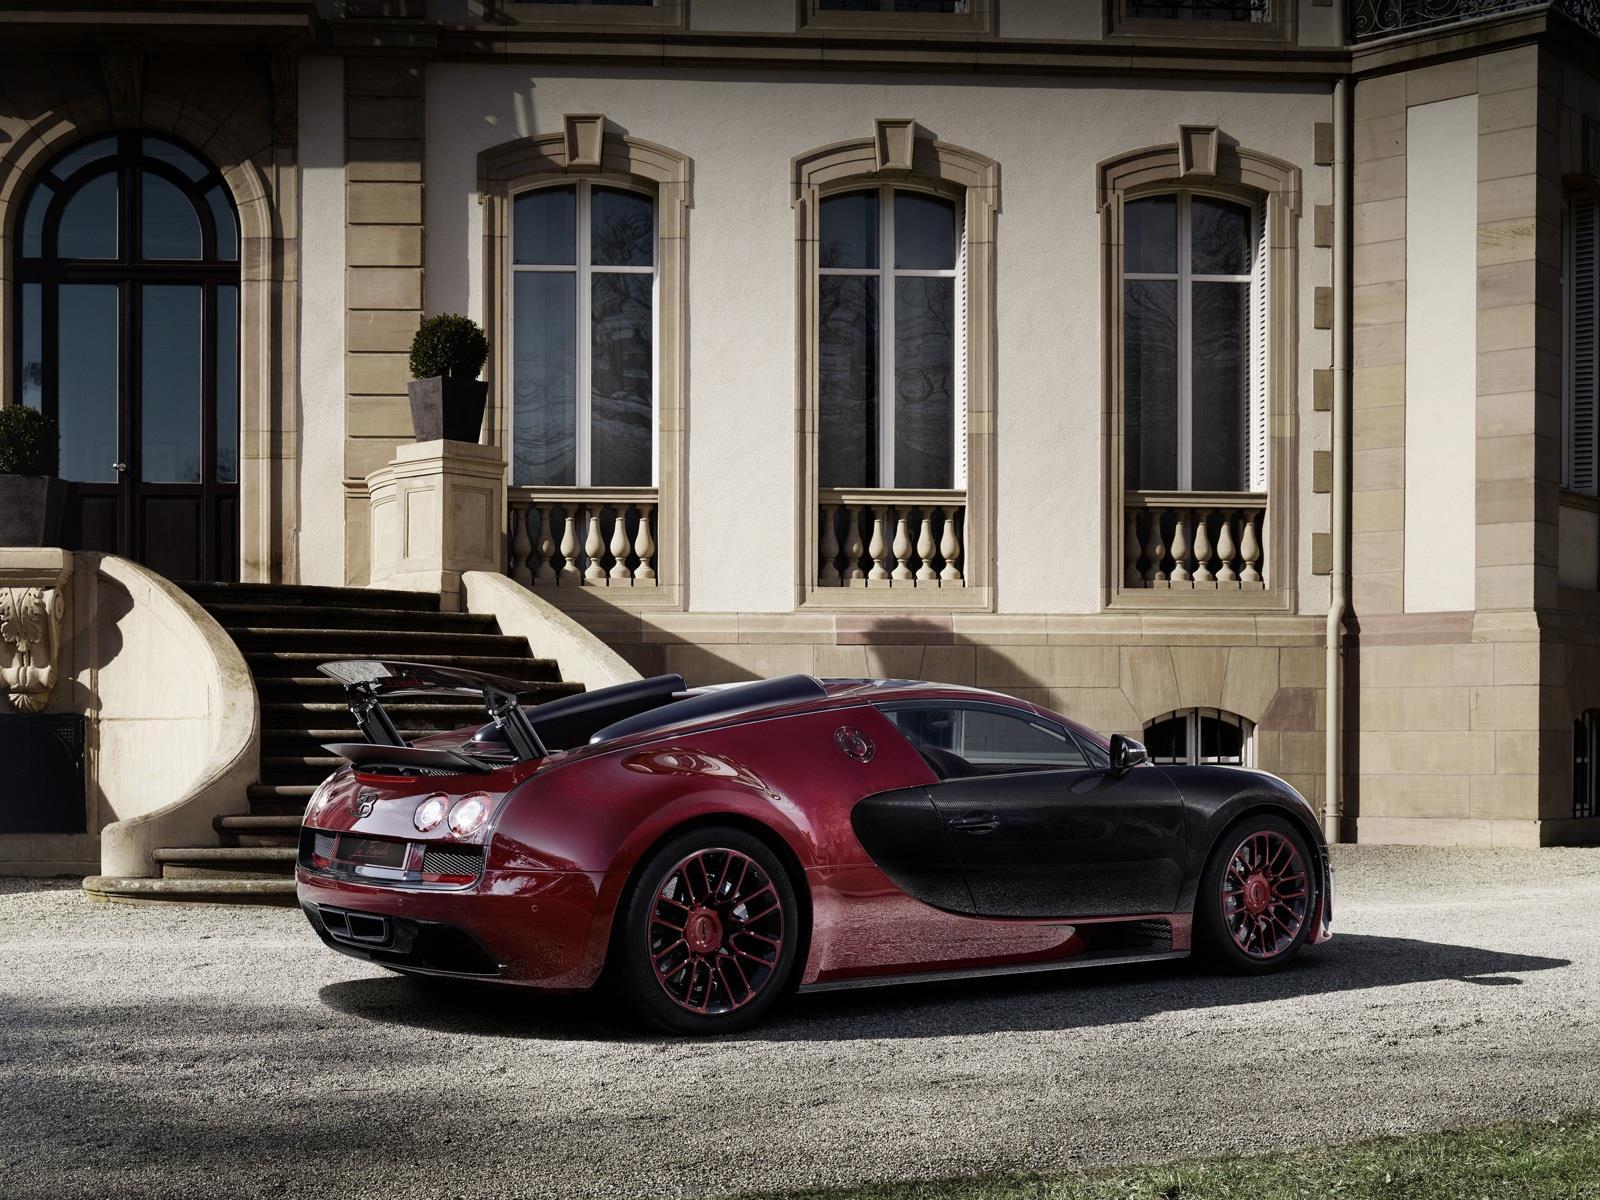 GAZ_a6c9b1b97e114f799f1ce4fd81cad38c Remarkable Bugatti Veyron Grand Sport Vitesse Informacion Cars Trend